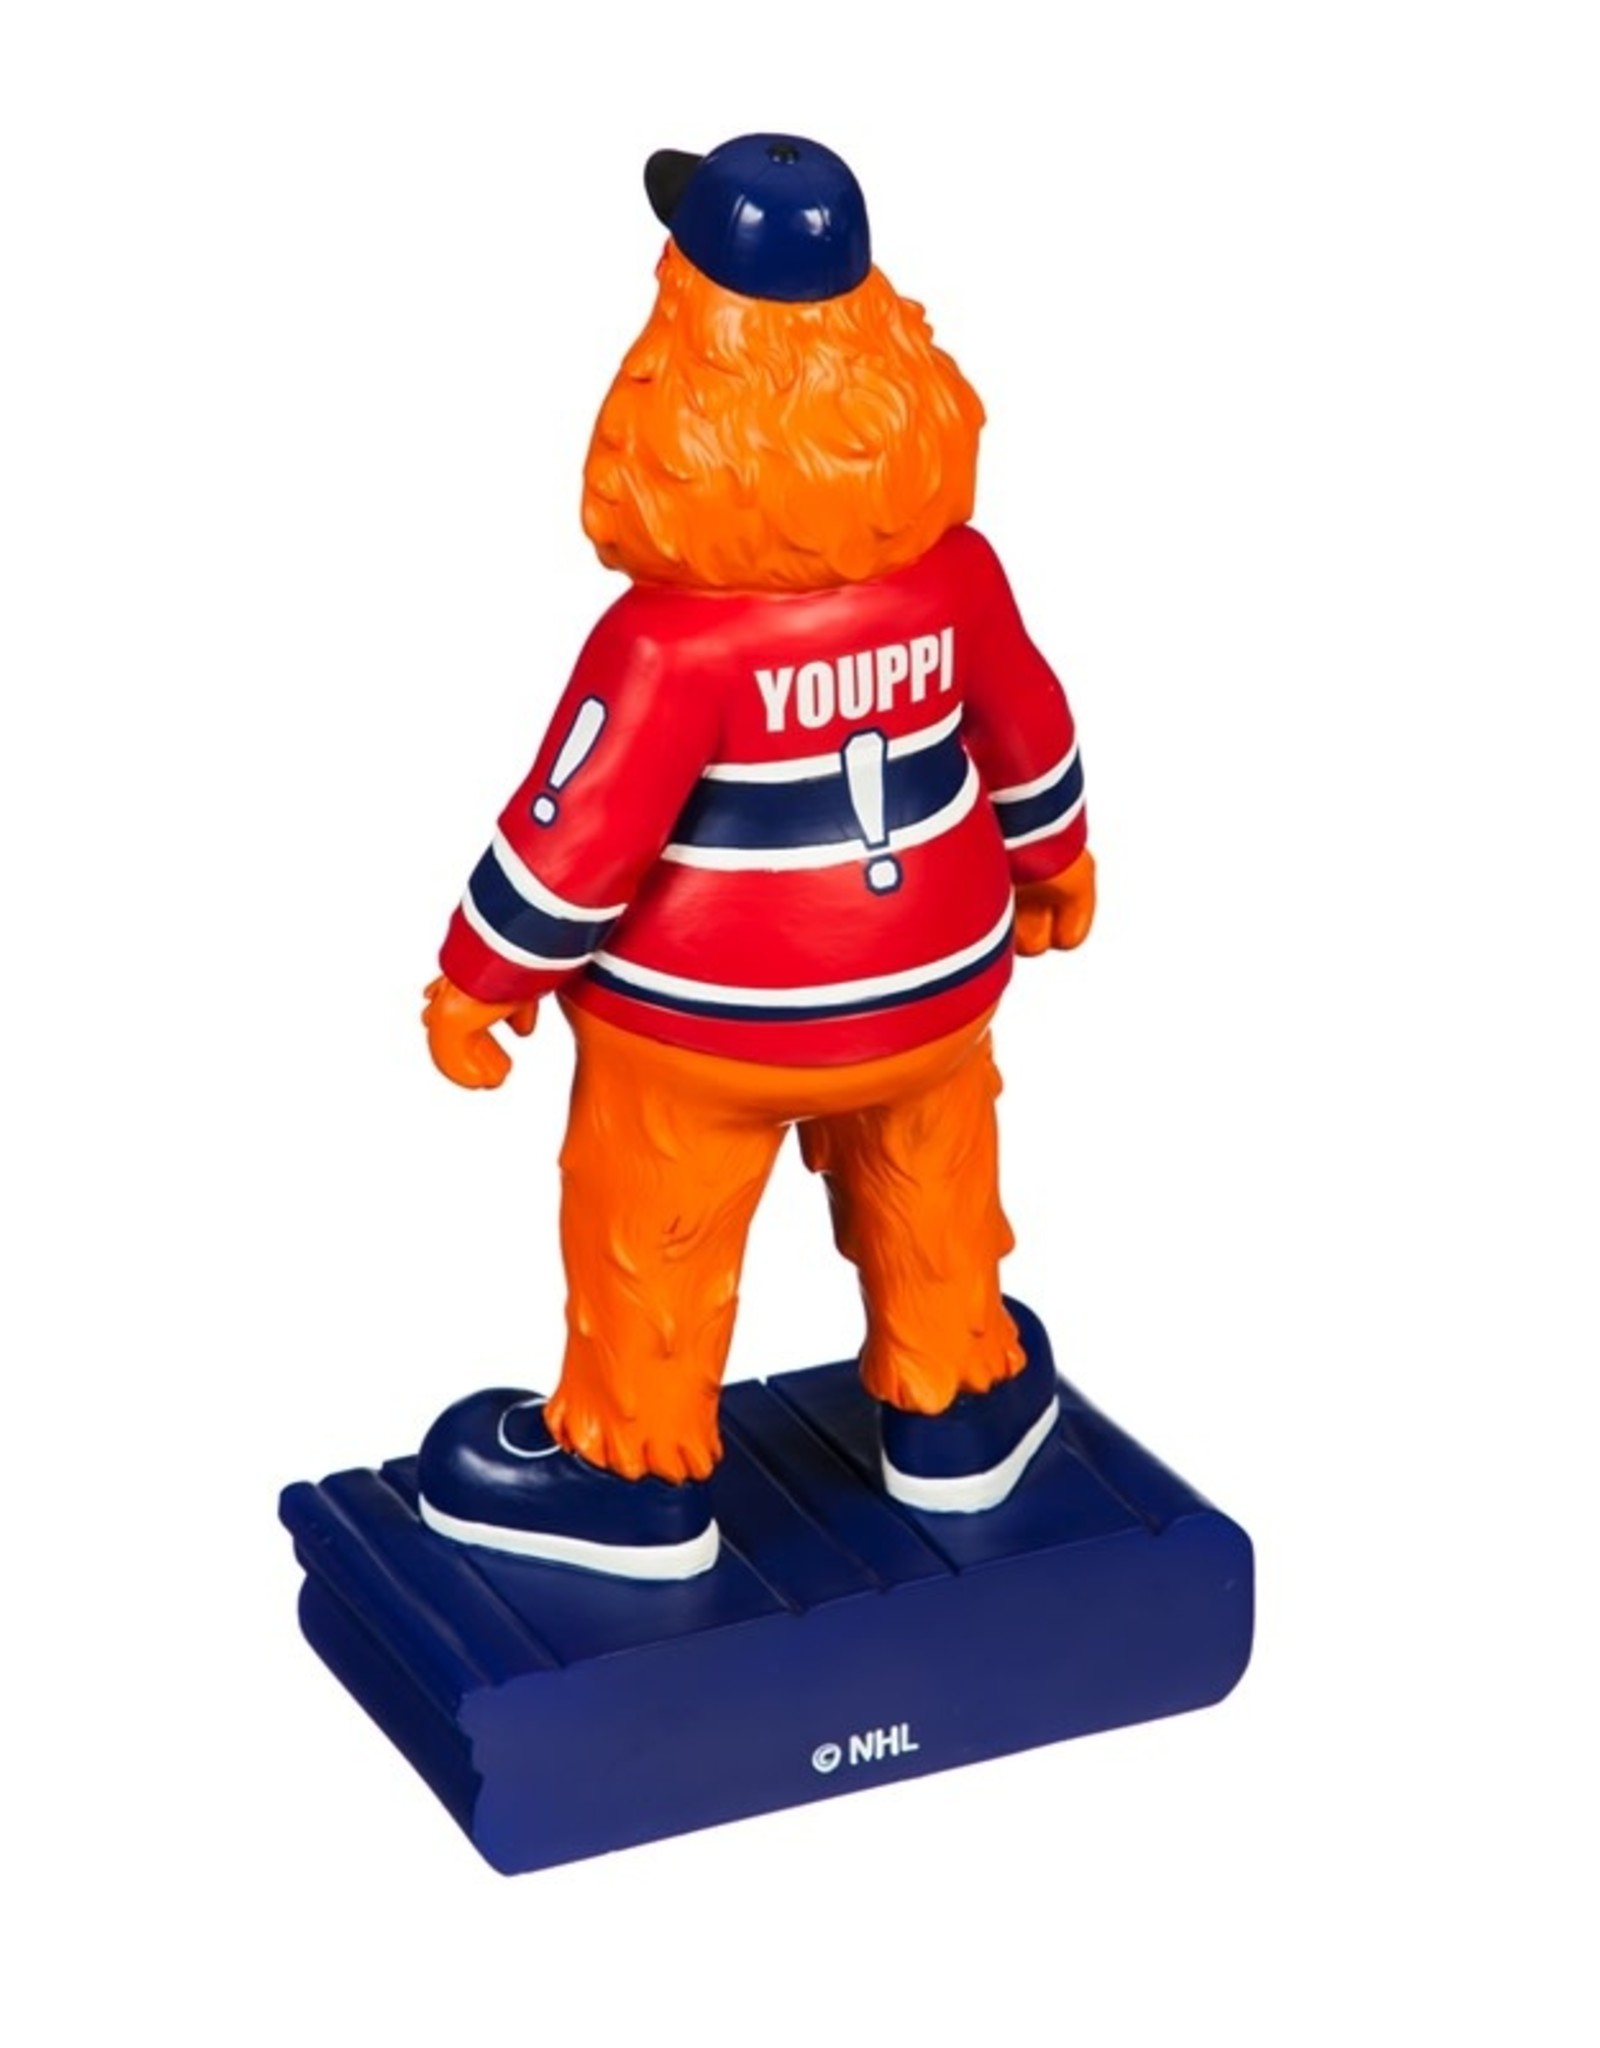 Team Sports Ameica NHL Team Mascot Statue Canadiens